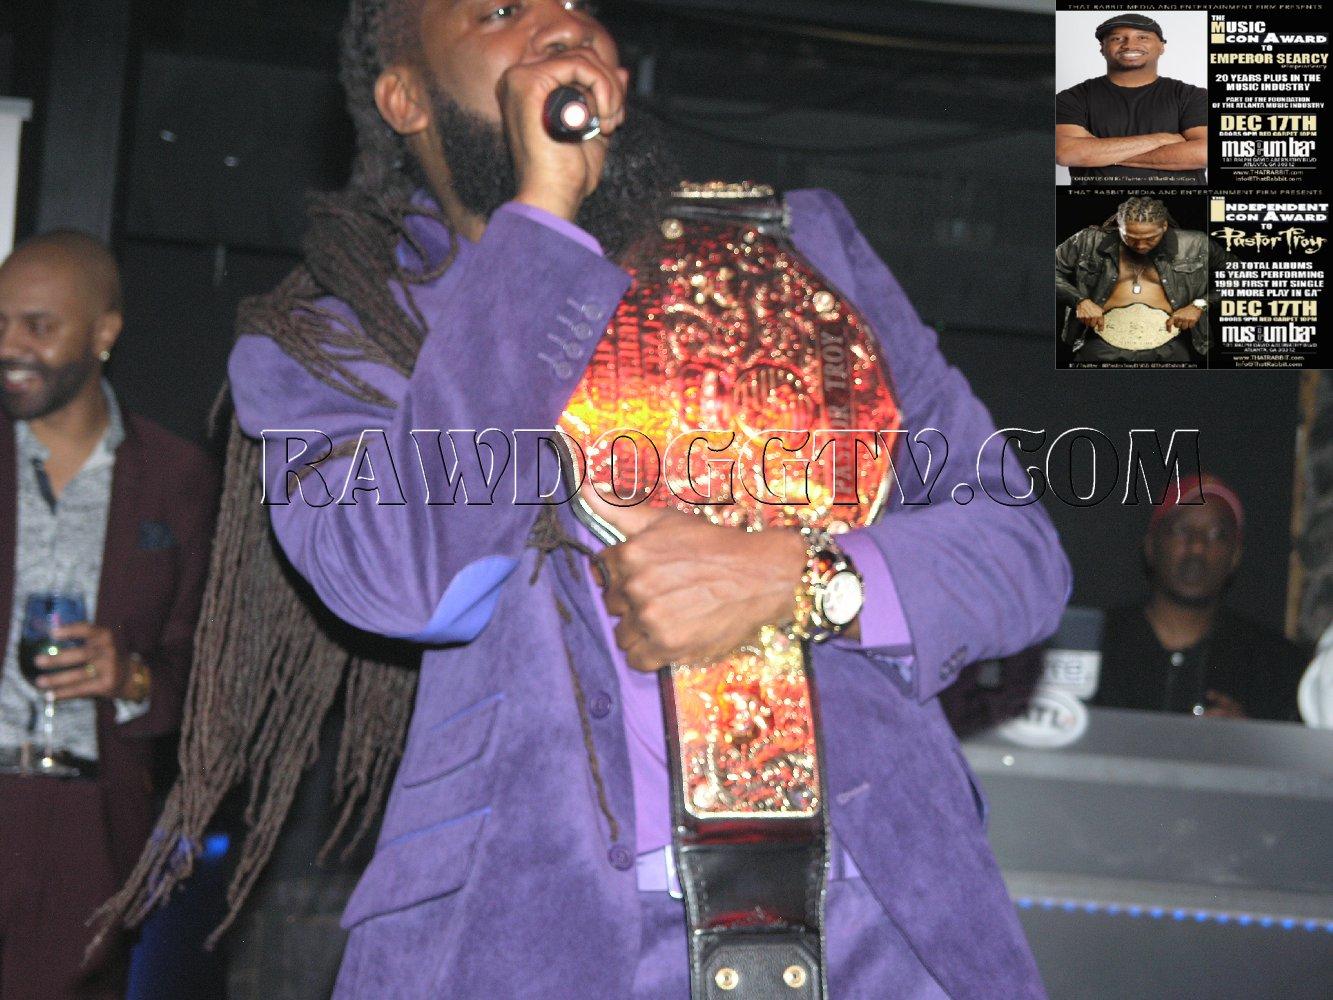 ThatRabbit Magazine Photos-ATL Legends Reunion-The Music Icon Award-Museum Bar Atlanta-Ray Hamilton- dec 17 2015 RAWDOGGTV 305-490-2182 (173)